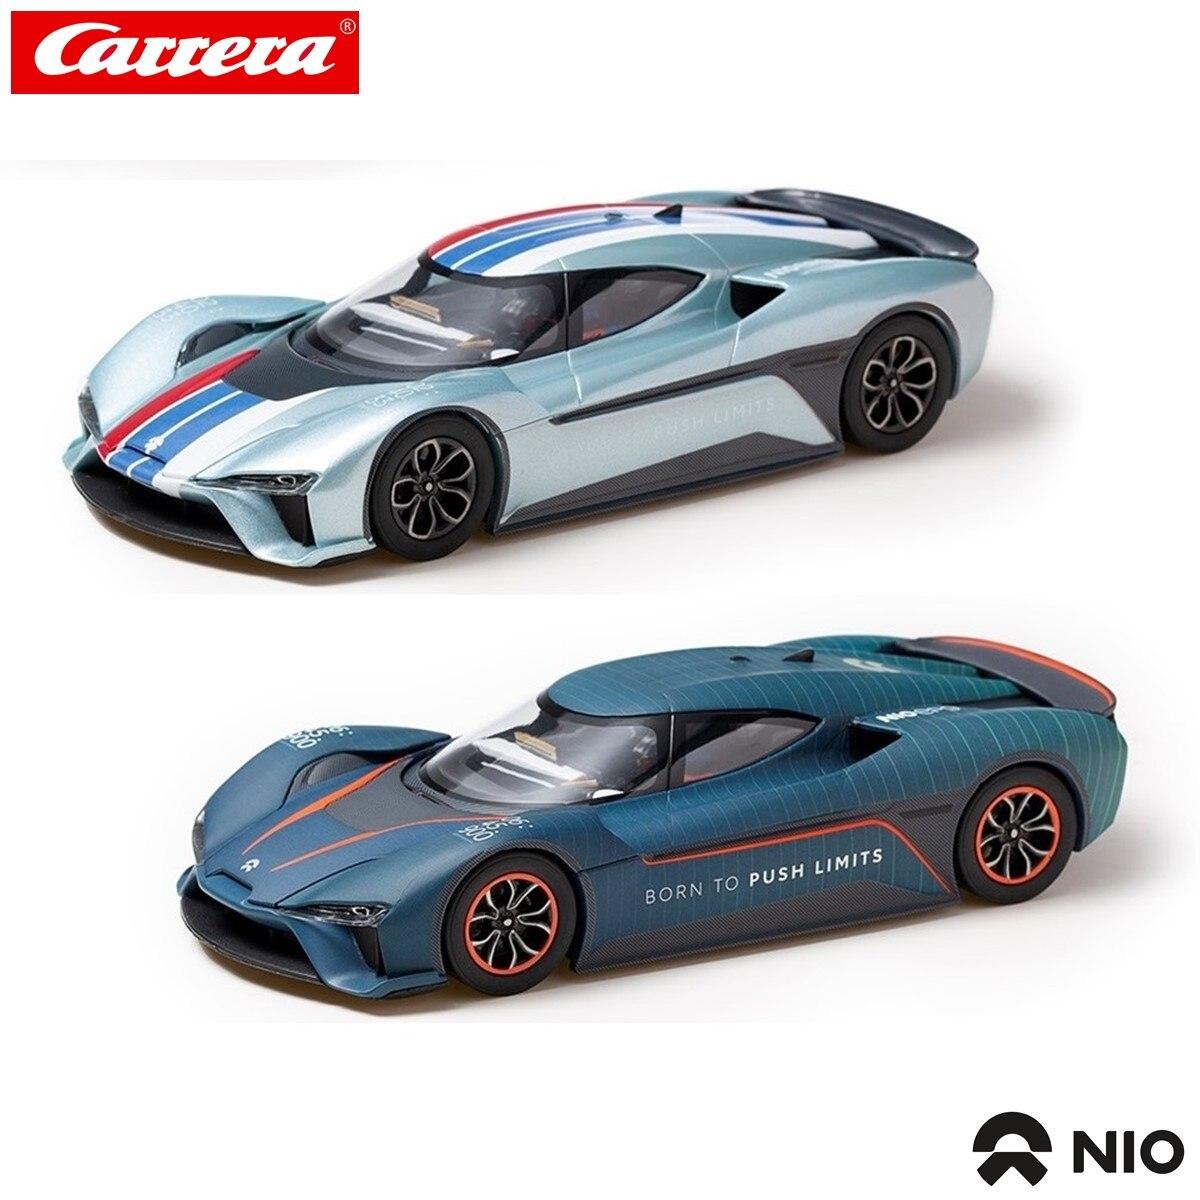 Автомобильный разъем Carrera Digital132 NIO EP9 Special Livery 1 / Special Livery 2